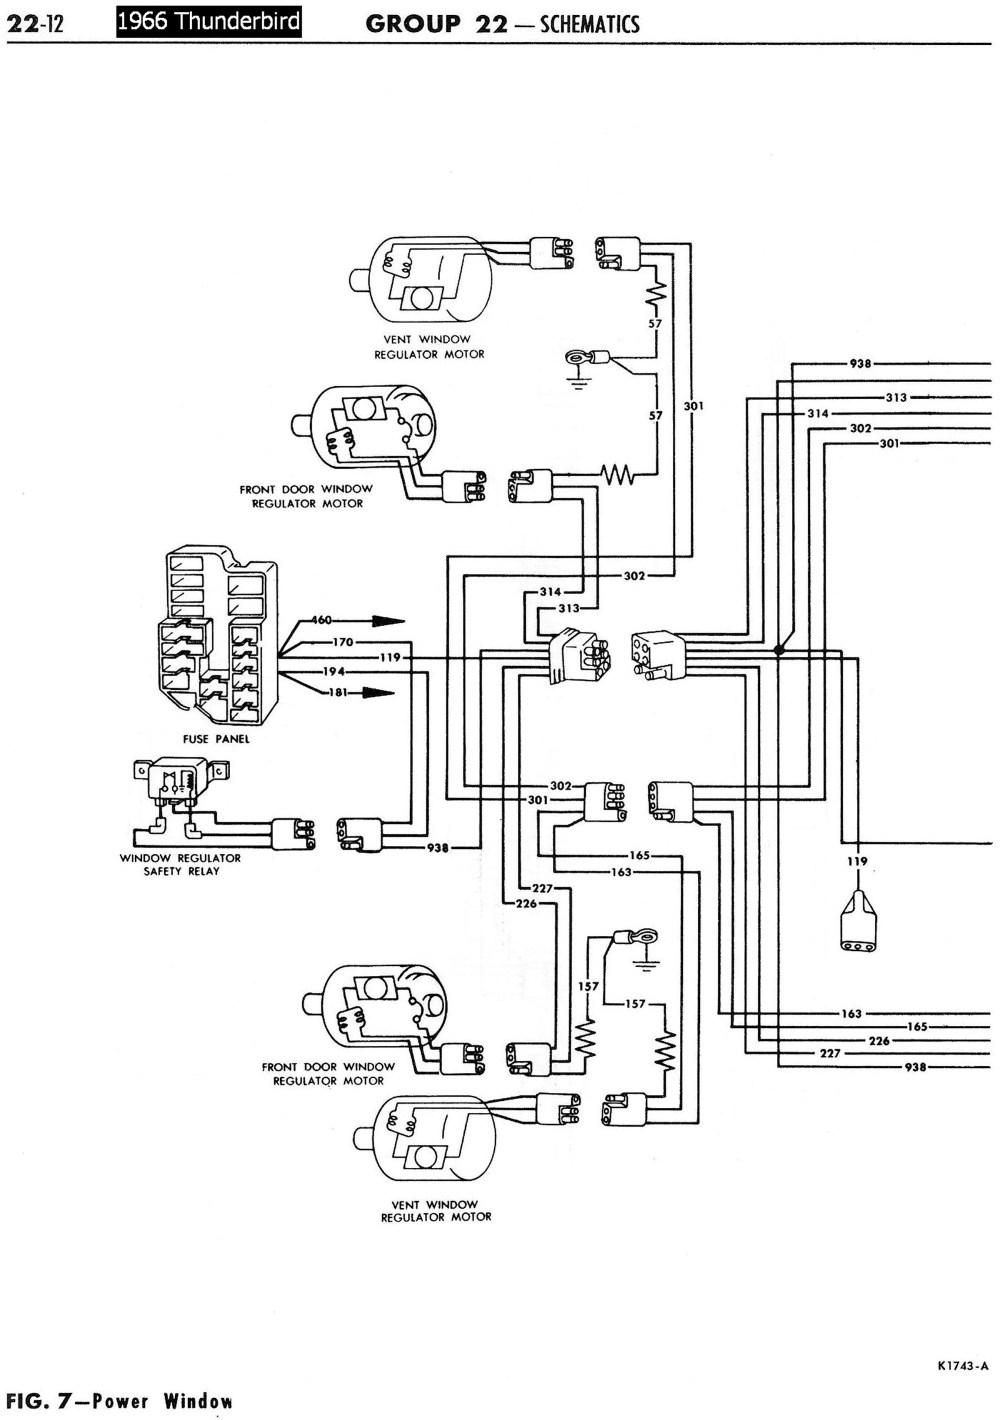 medium resolution of 1958 68 ford electrical schematics 1964 galaxie 500 headlight switch diagram 1964 ford t bird wiring